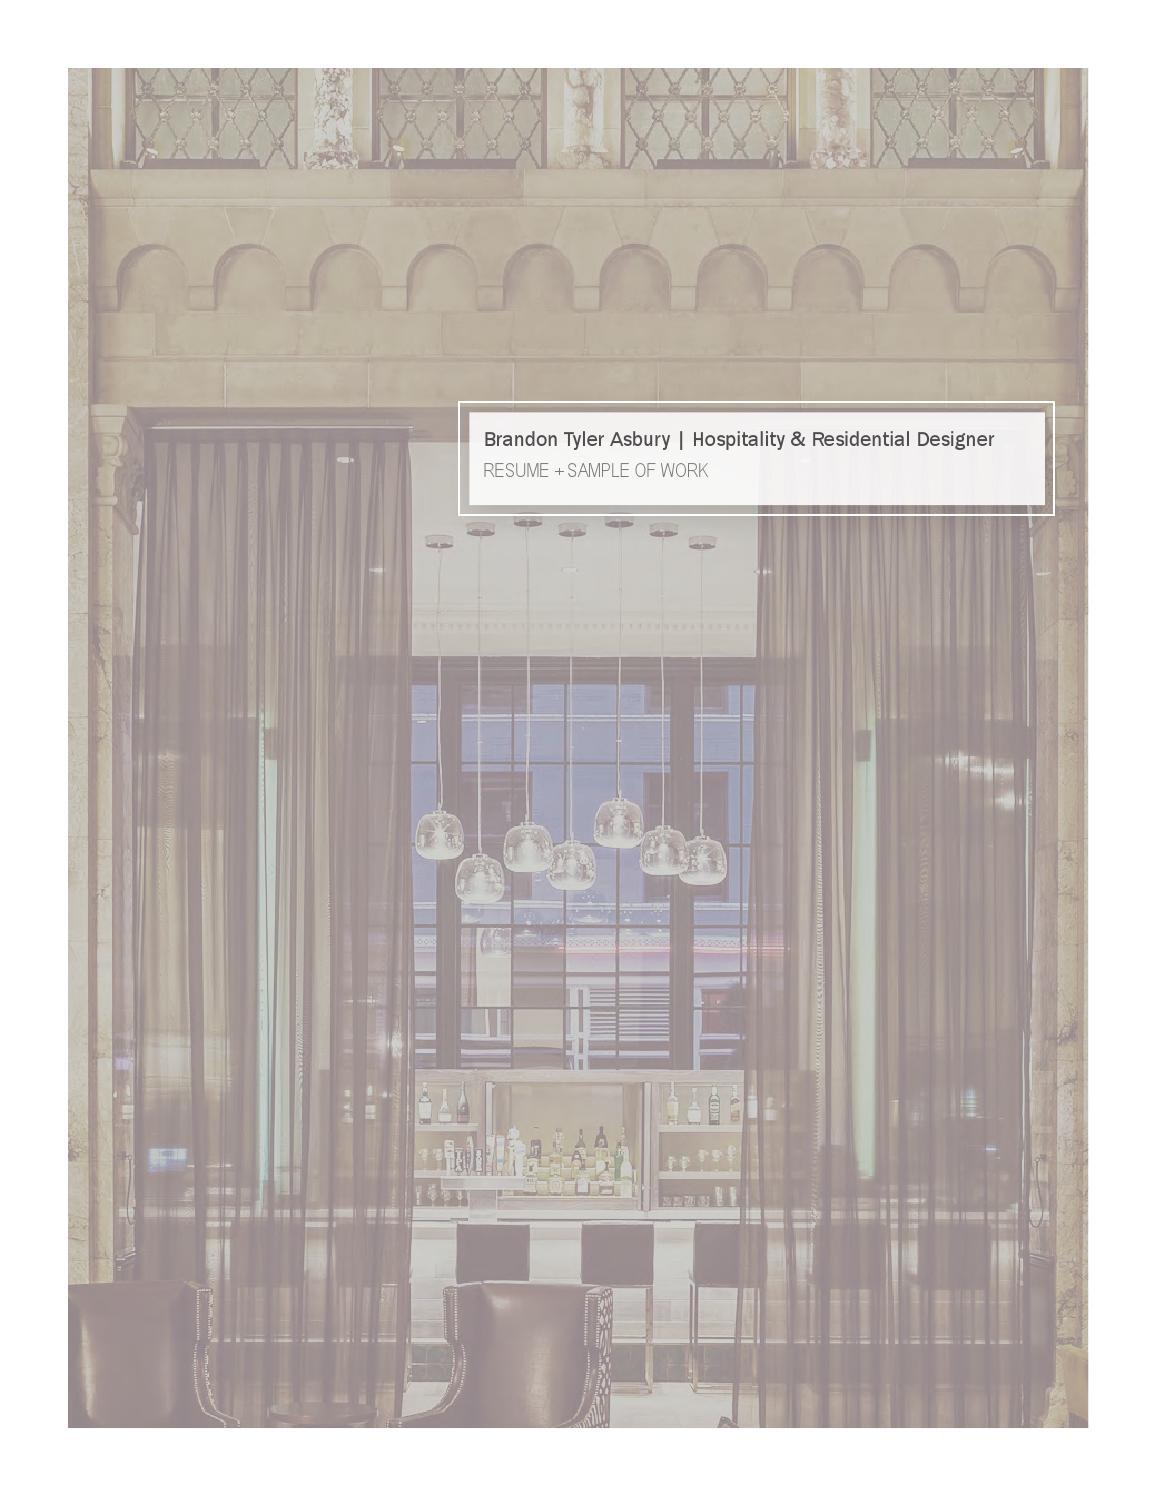 brandon asbury resume and sample of work by brandon asbury